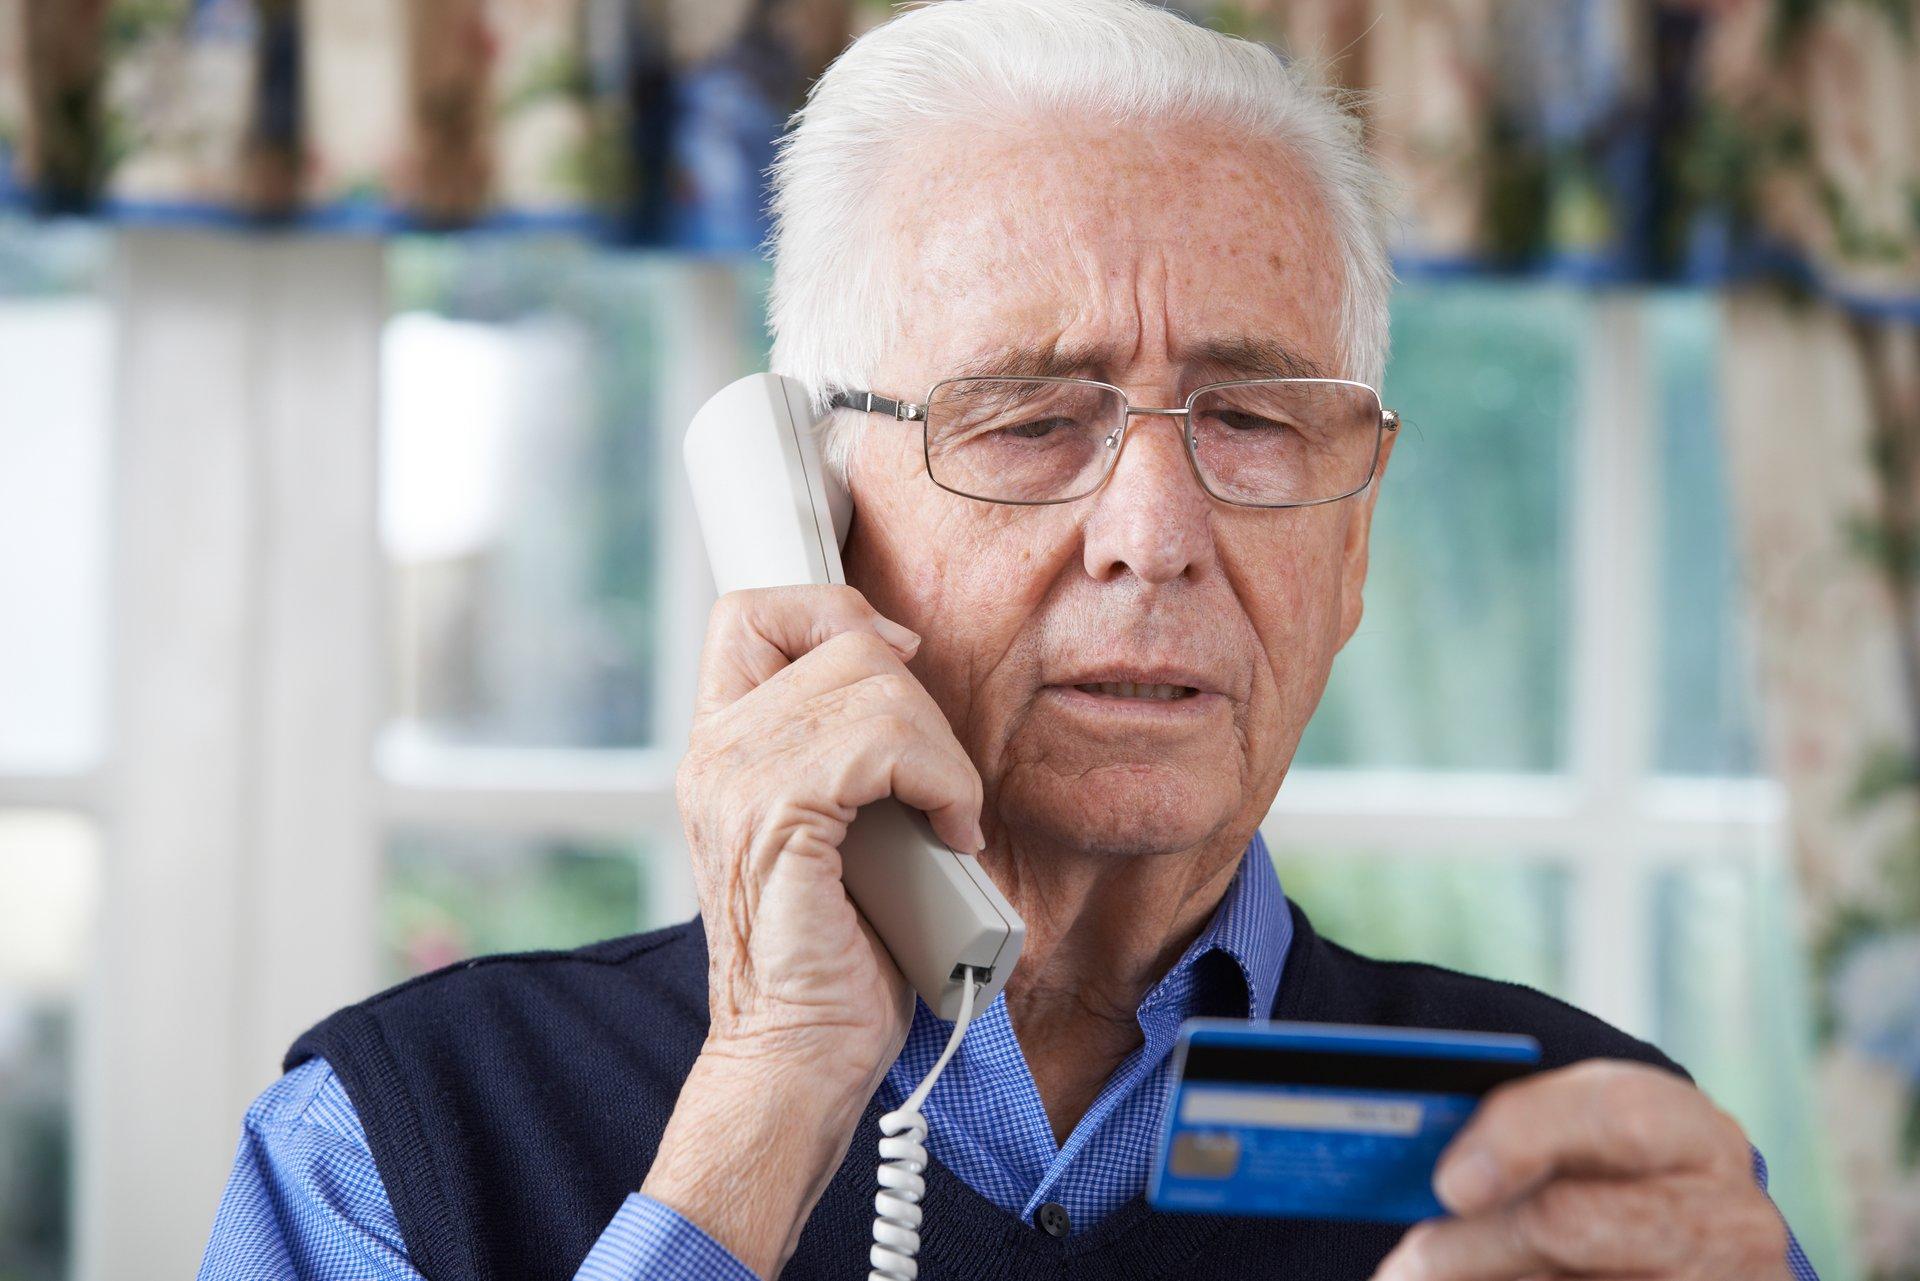 Senior Man Giving Credit Card